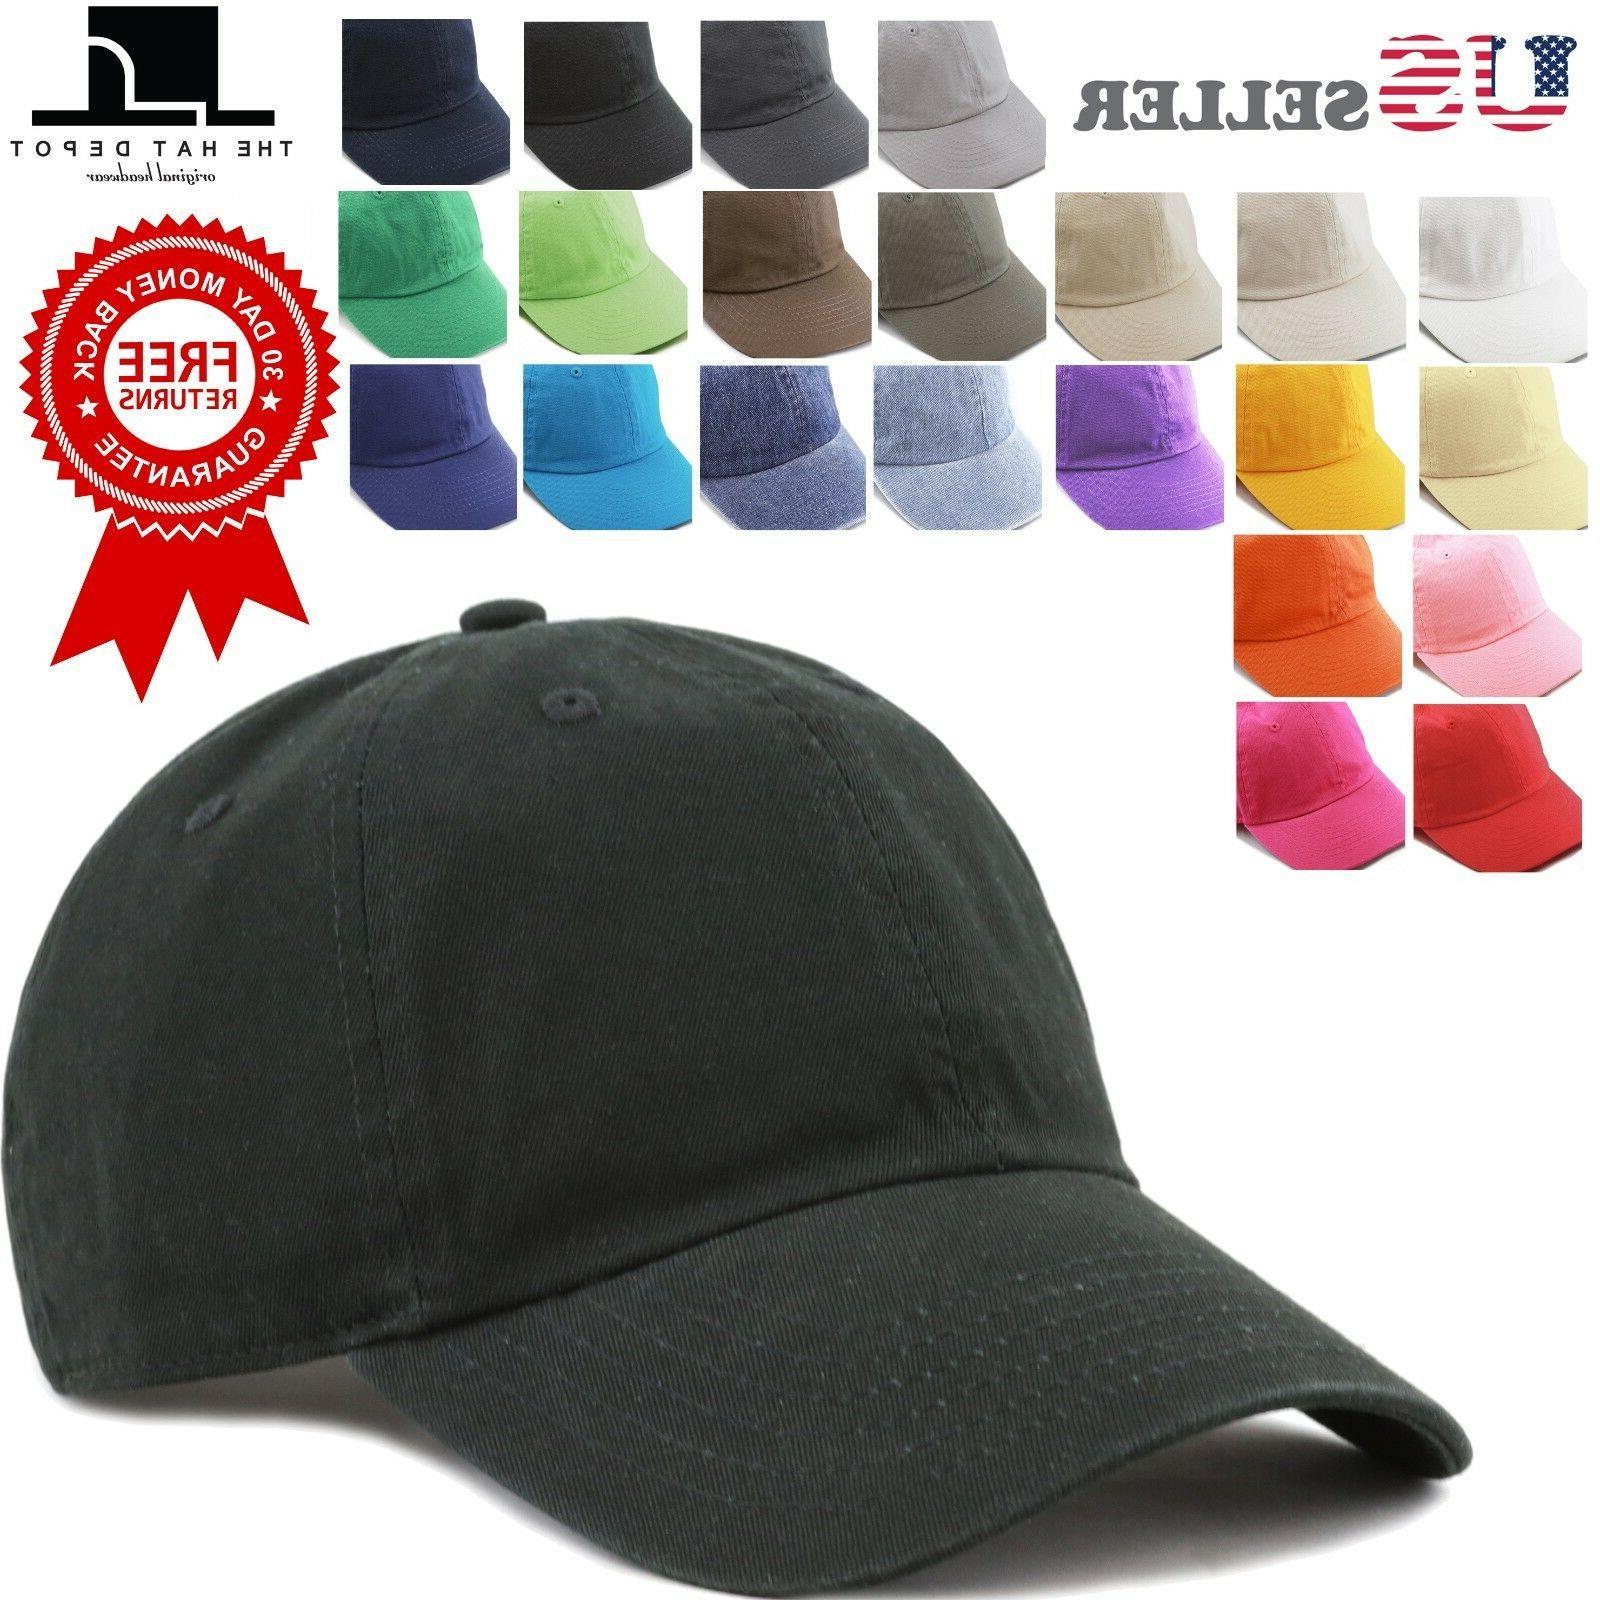 plain cotton baseball cap washed low profile